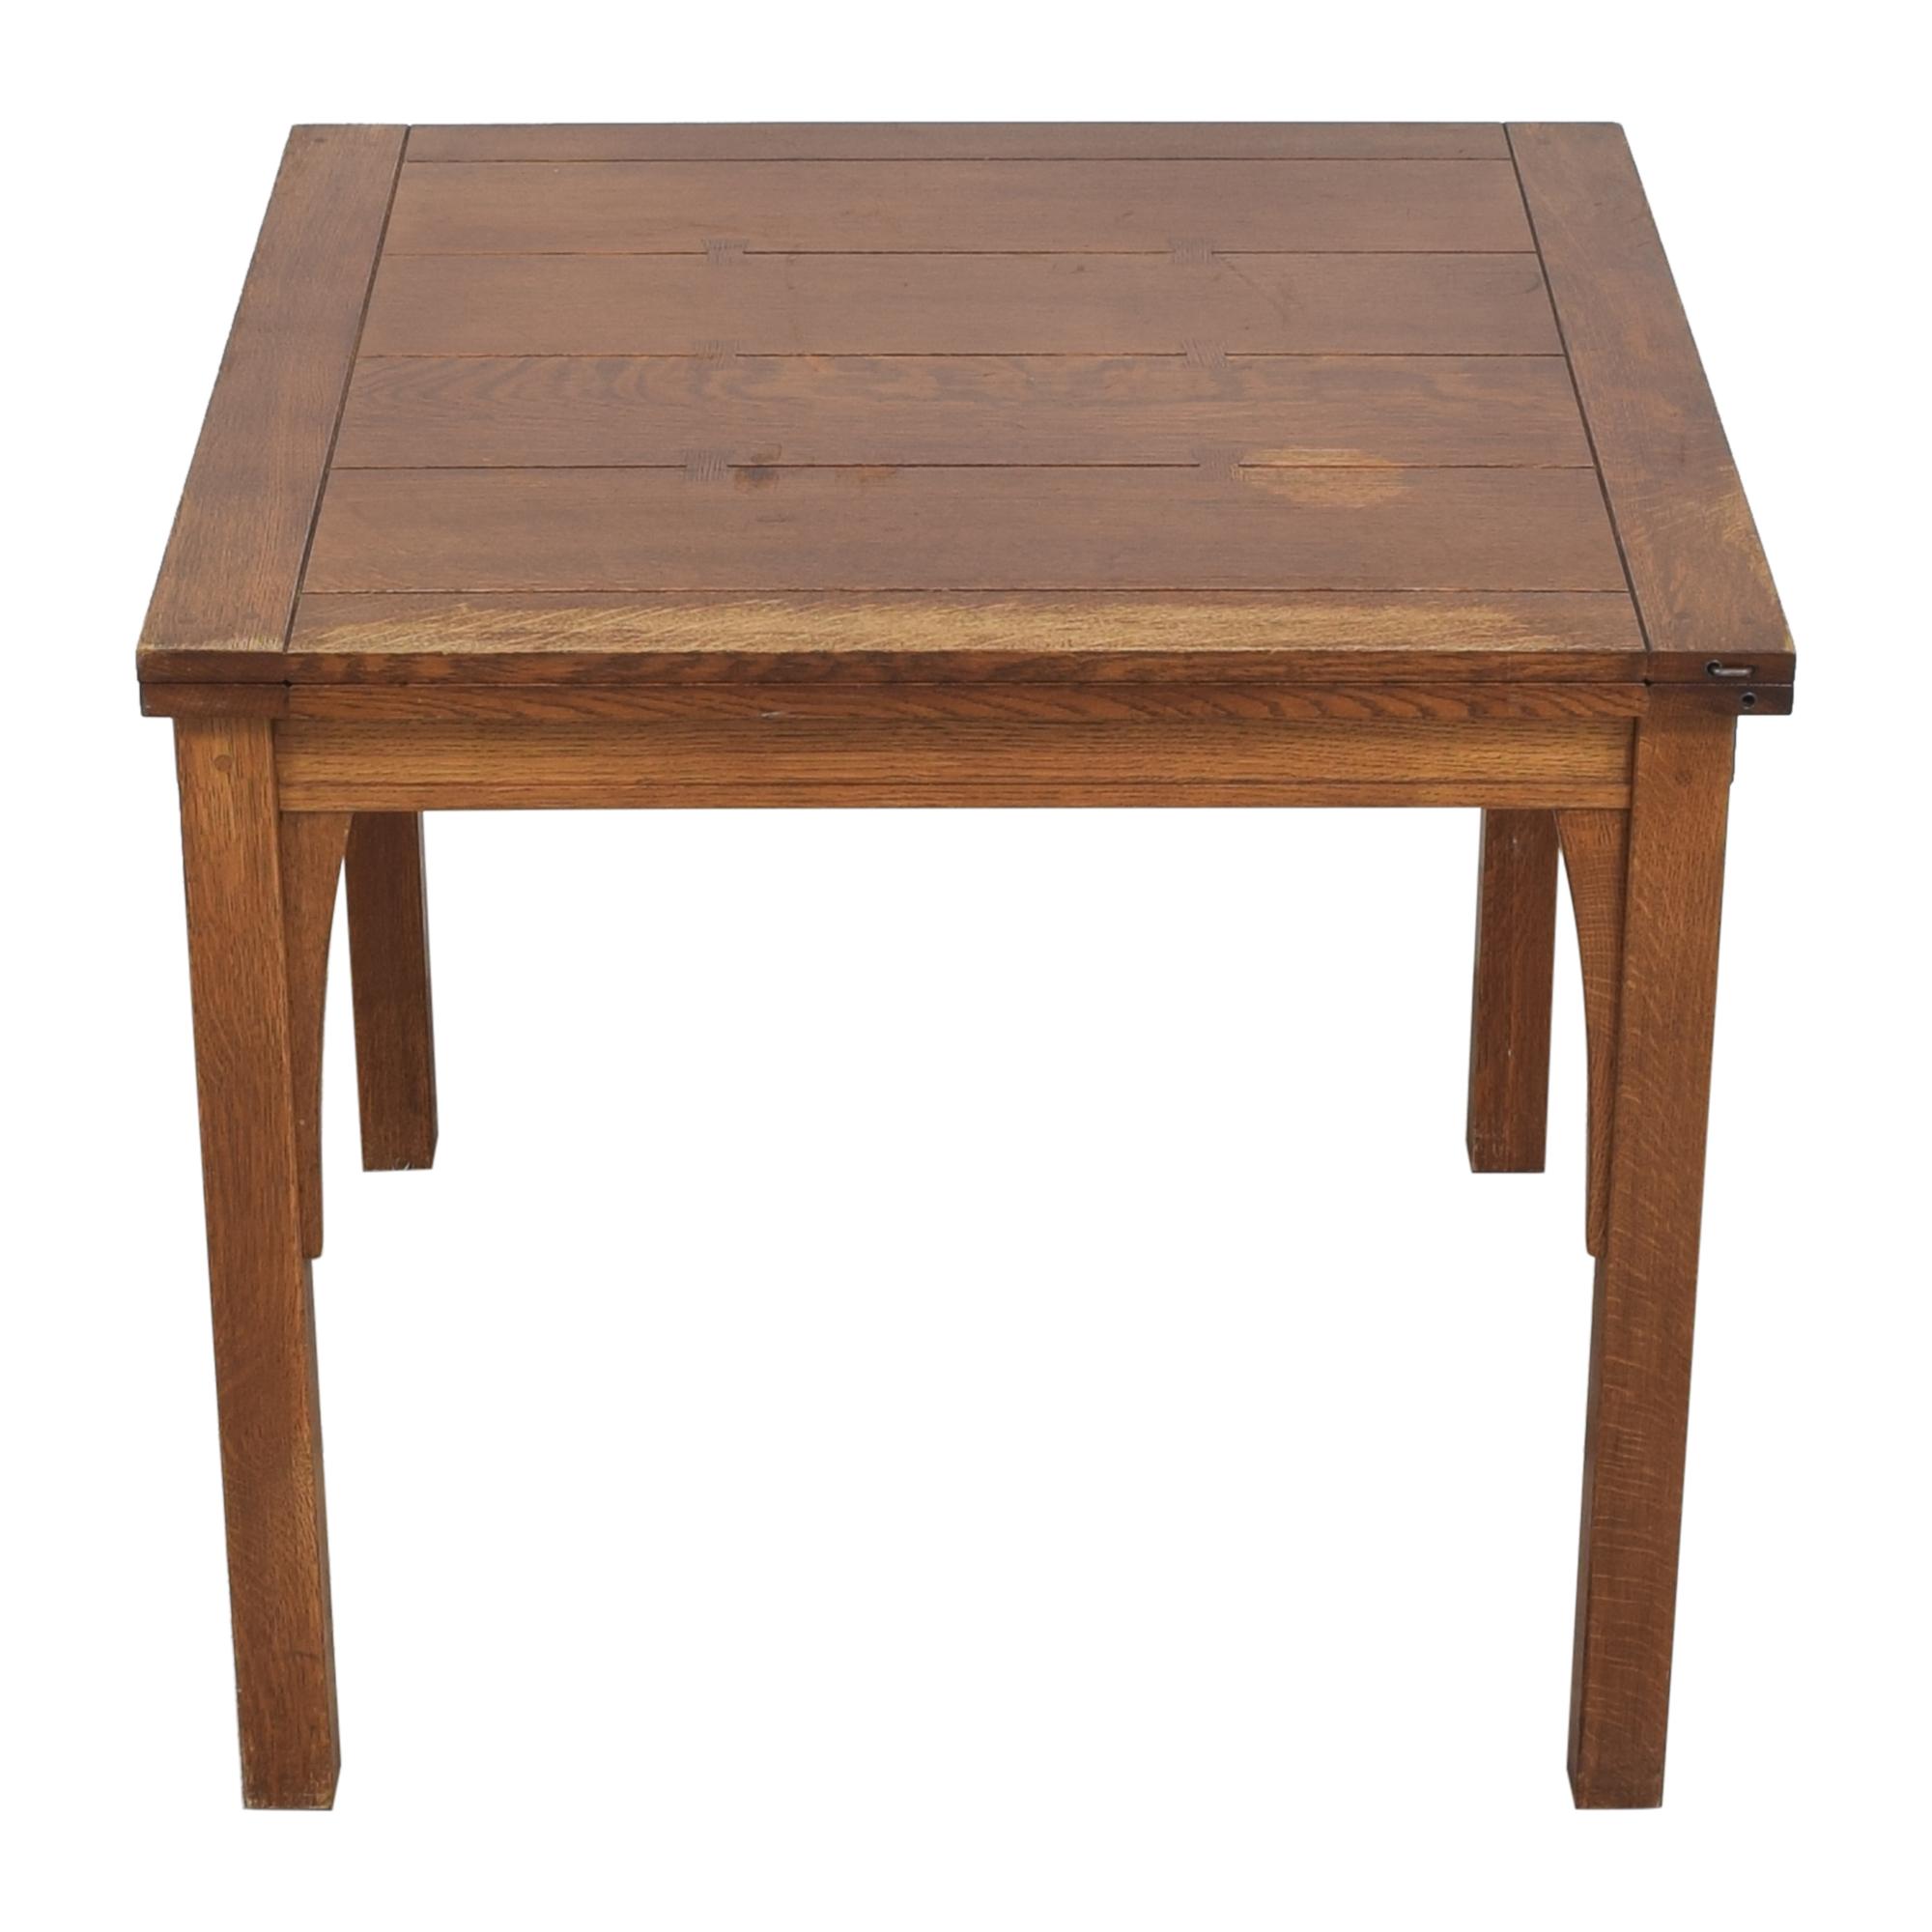 Stickley Furniture Stickley Furniture Mission Flip Top Extendable Table Dinner Tables